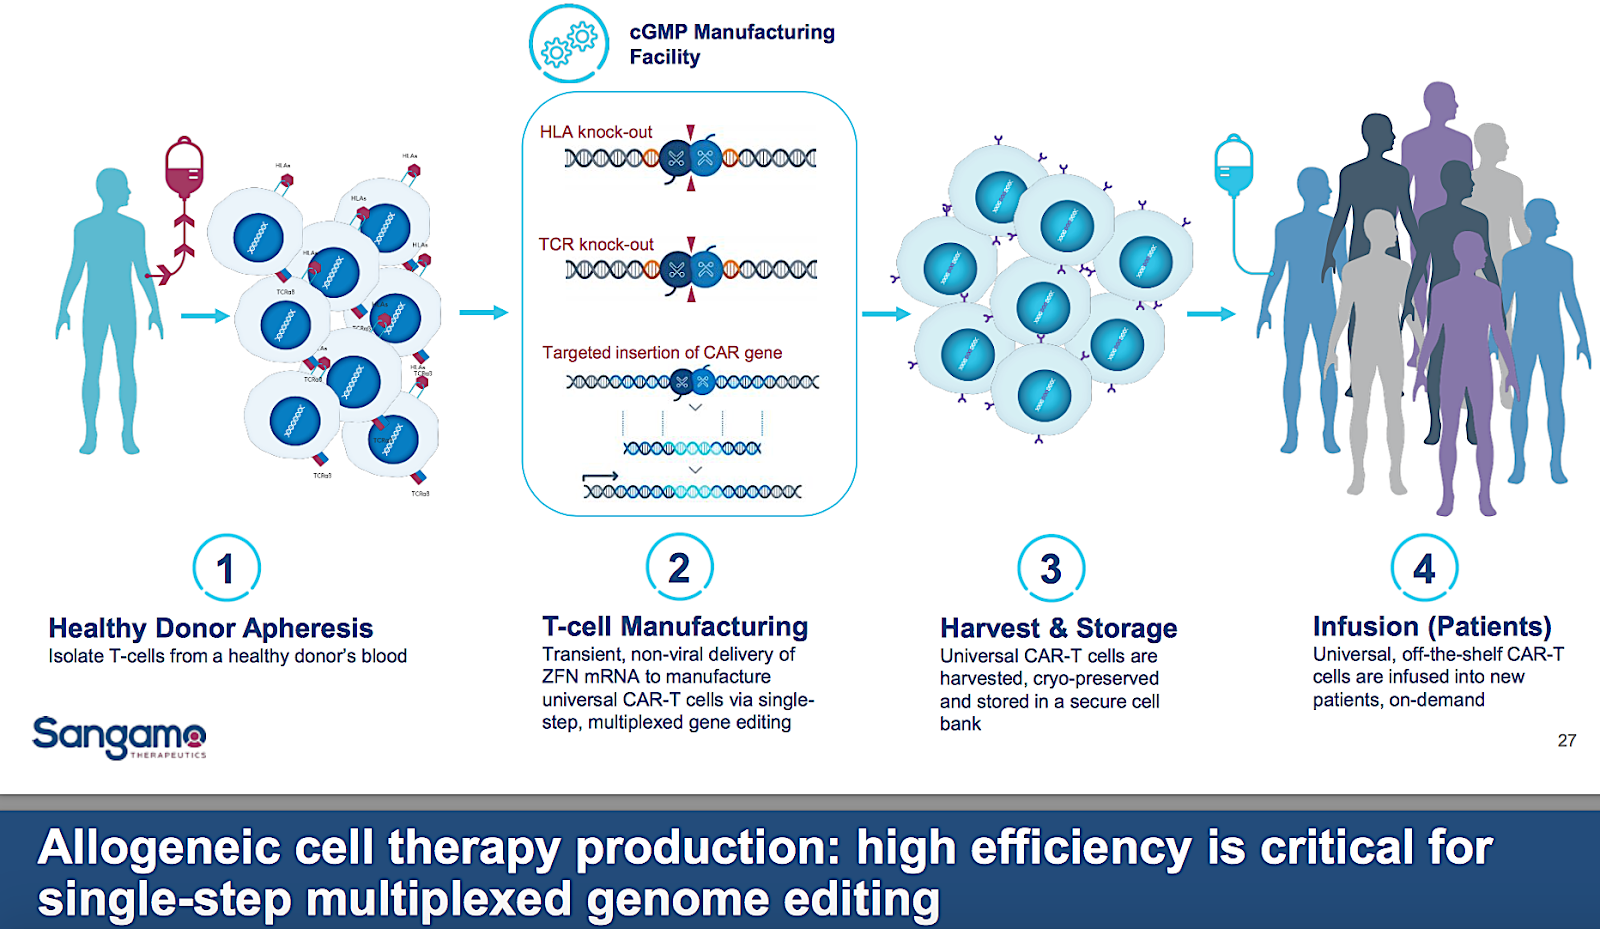 Crsp crispr therapeutics ag crowdsourced stock ratings sauploadhpwfu7kz3hf5md0vivzdiyg10oxh3t4qnsbb7ib8nvmz40afghiw1lxrylo1zufcsmee9aulqa3fx6whhpjniyqswezietwepahyagdlptkom2mxqwnhqb5fuq14ig13jthumb1g biocorpaavc Image collections